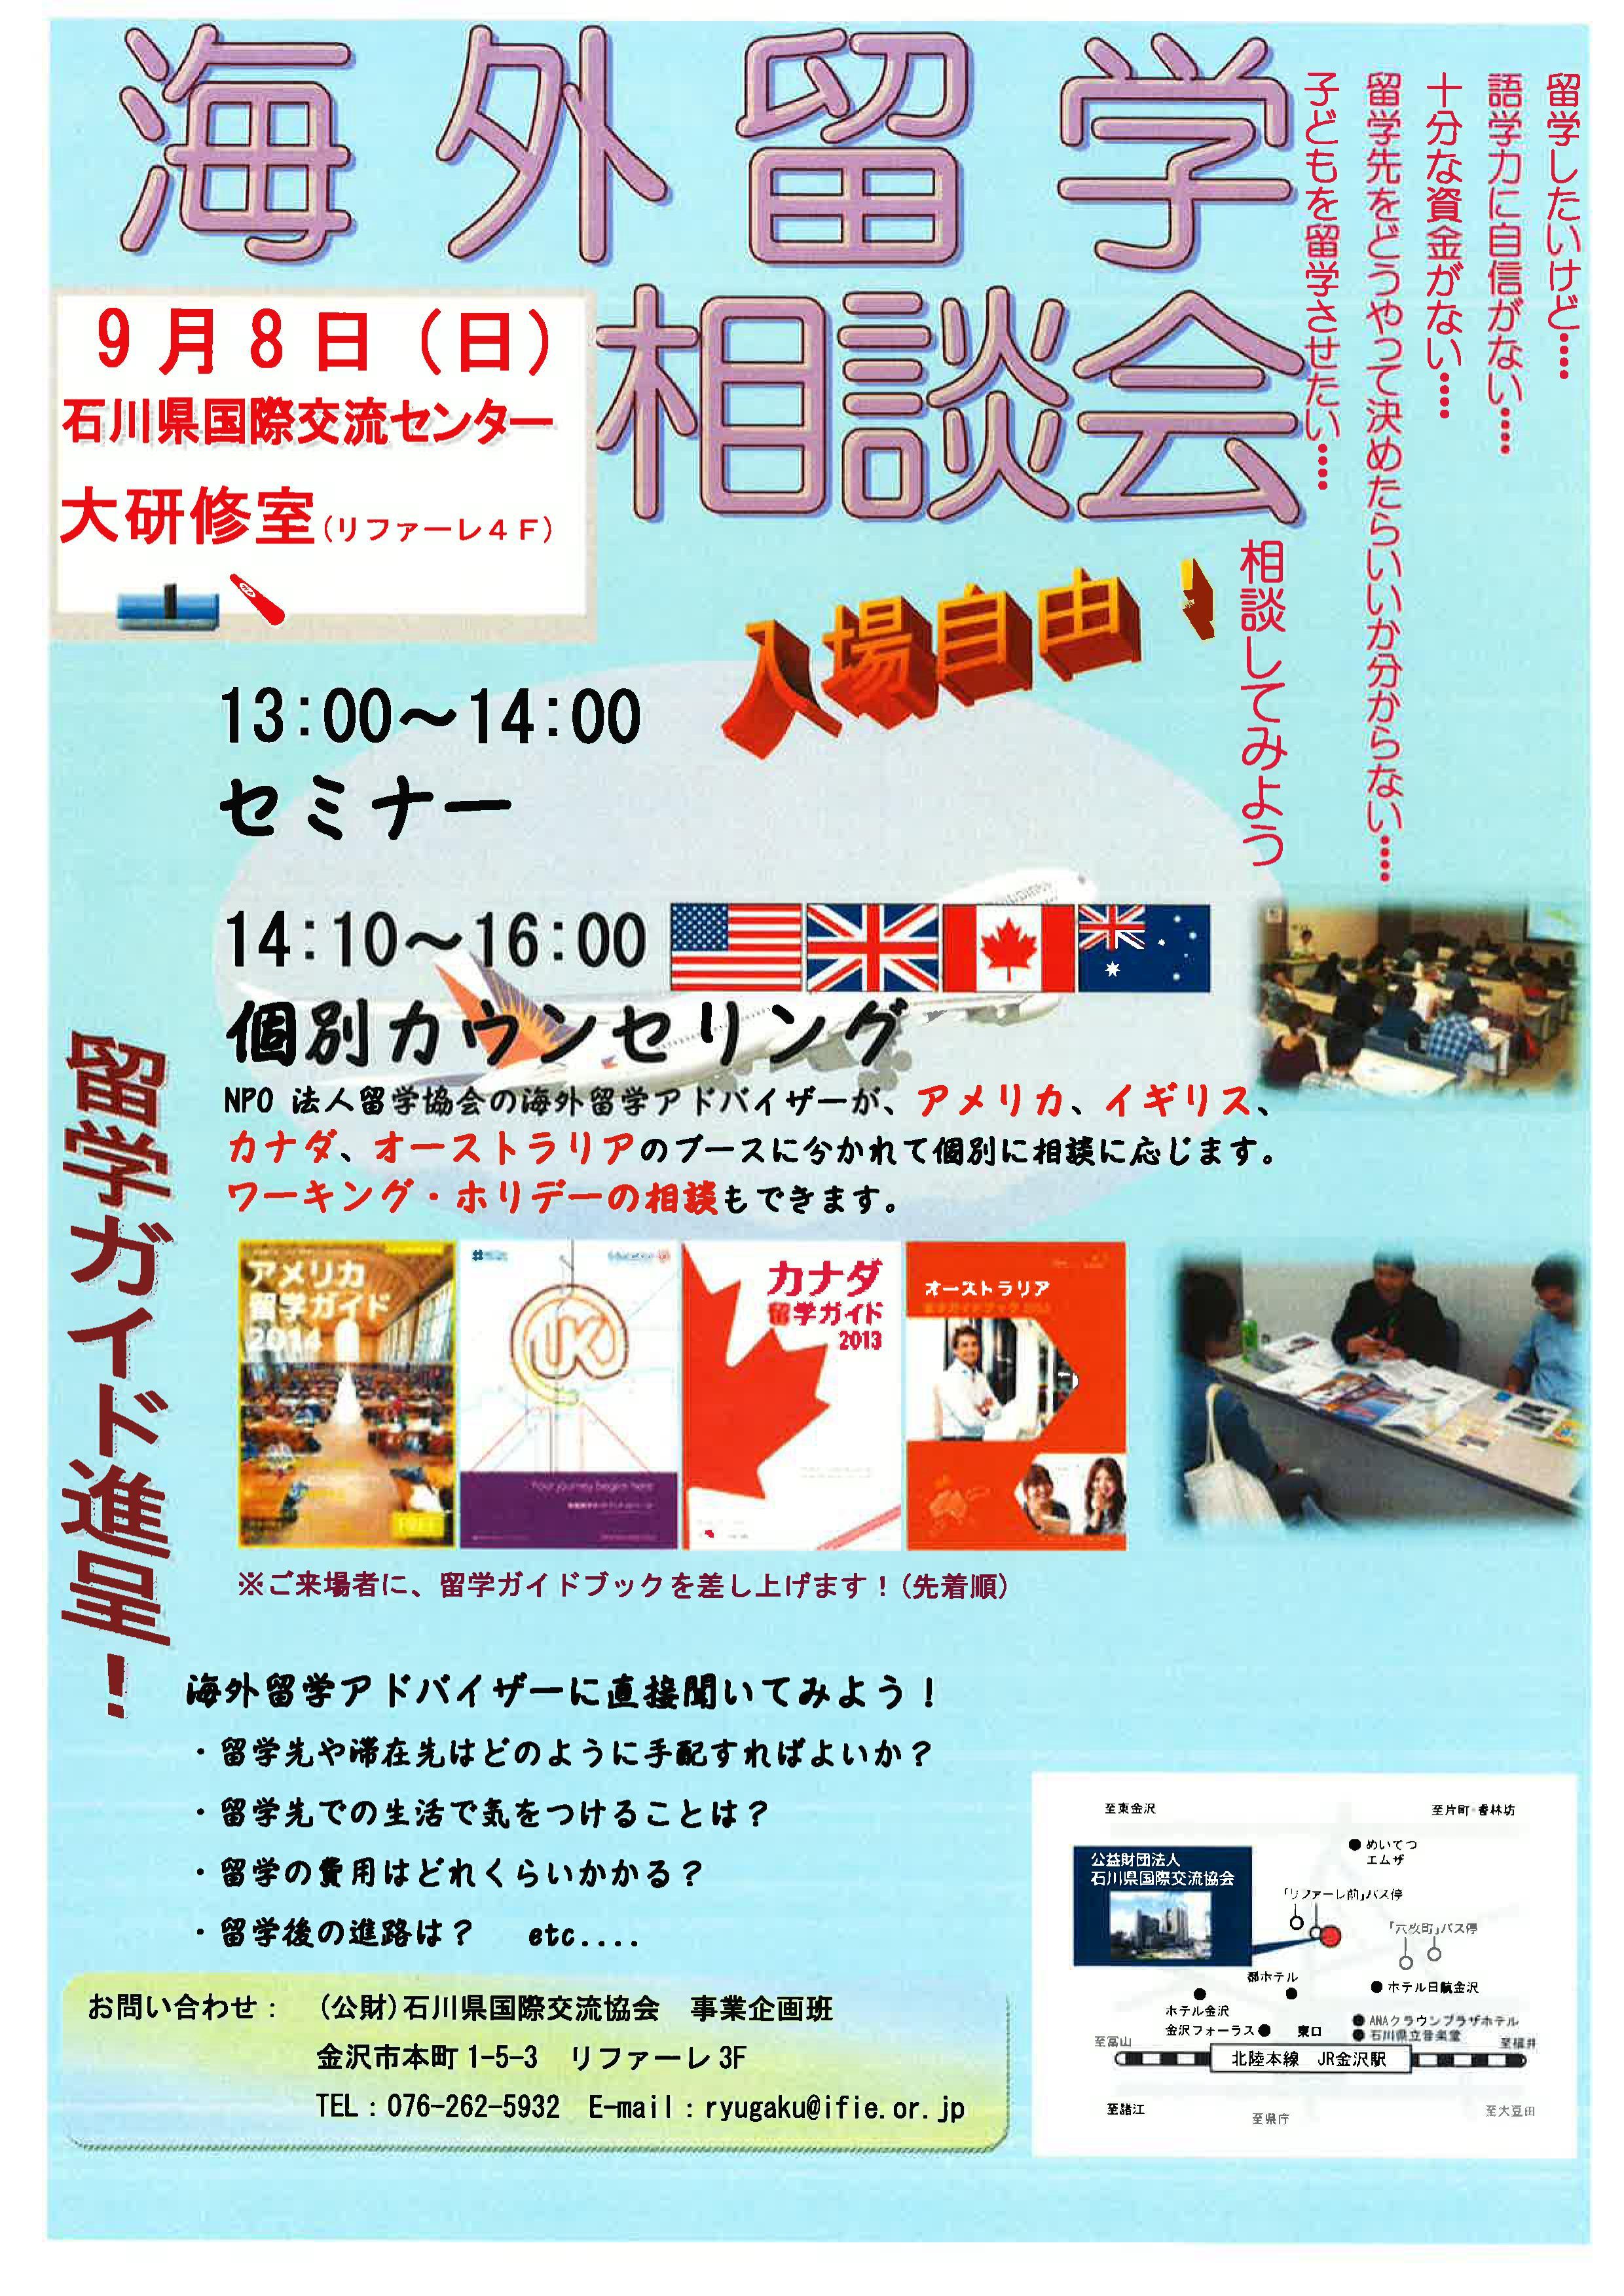 海外留学相談会―石川県国際交流センター